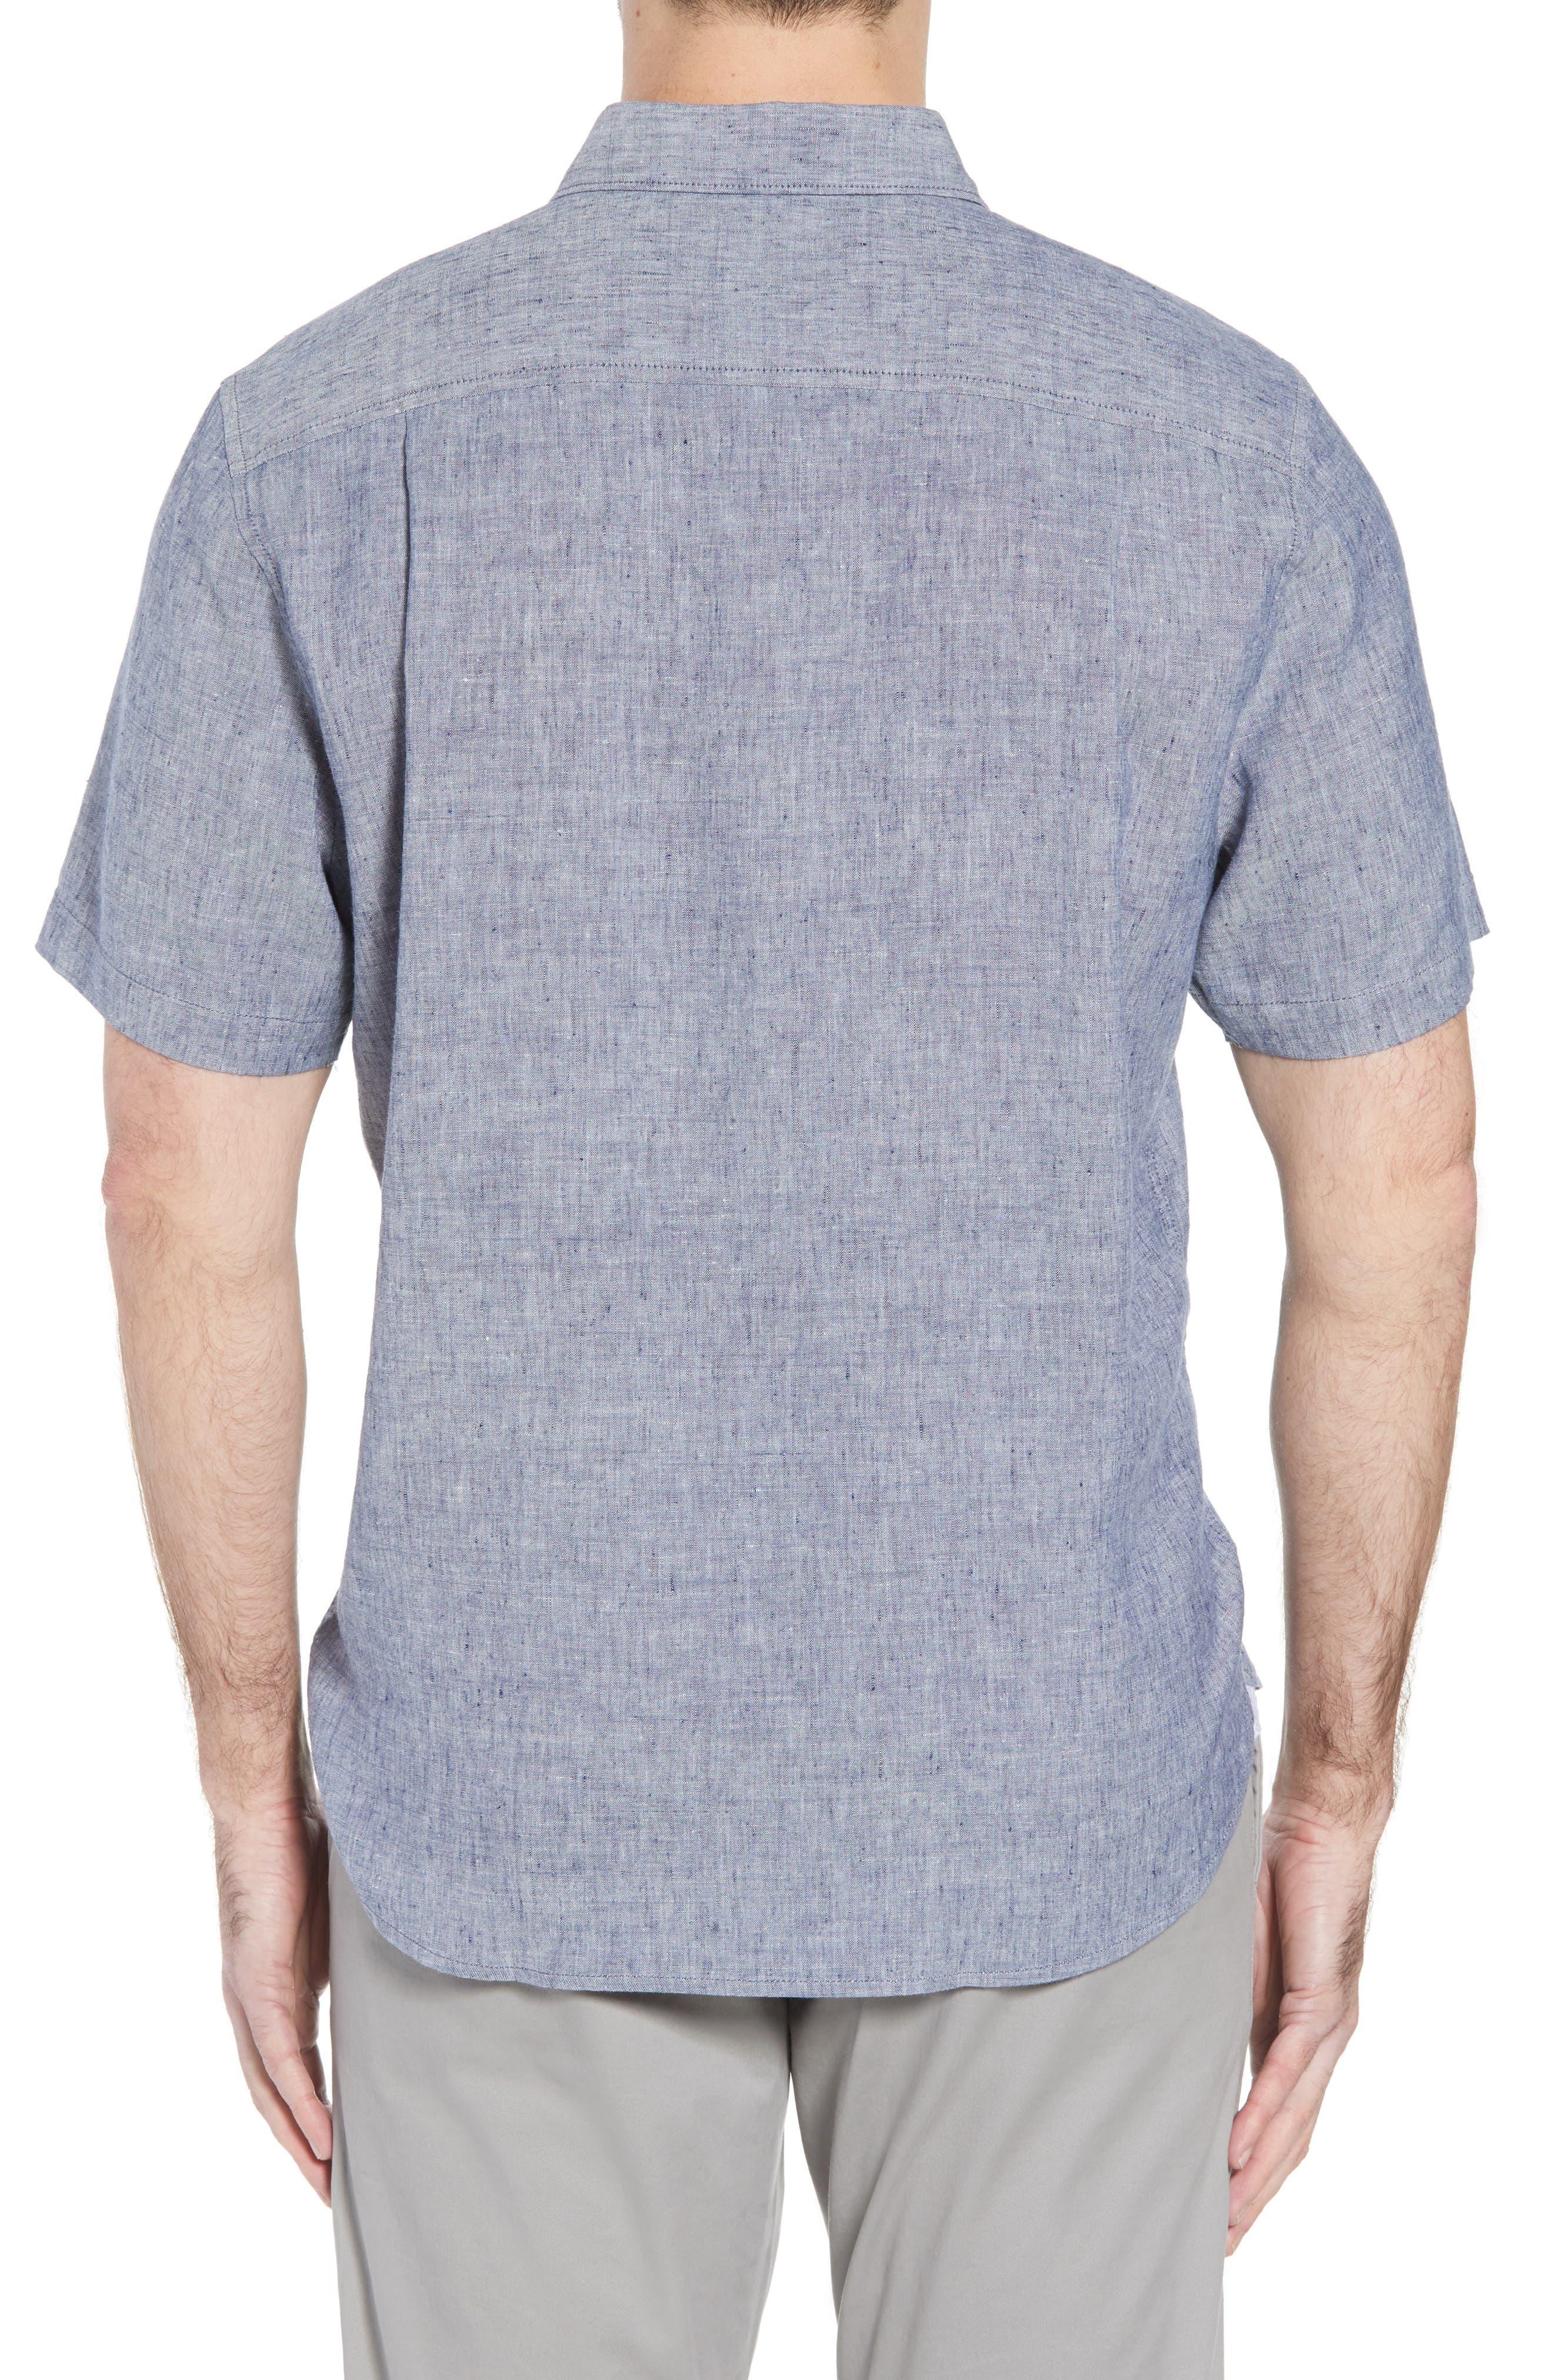 Lanai Tides Linen Blend Sport Shirt,                             Alternate thumbnail 2, color,                             THRONE BLUE